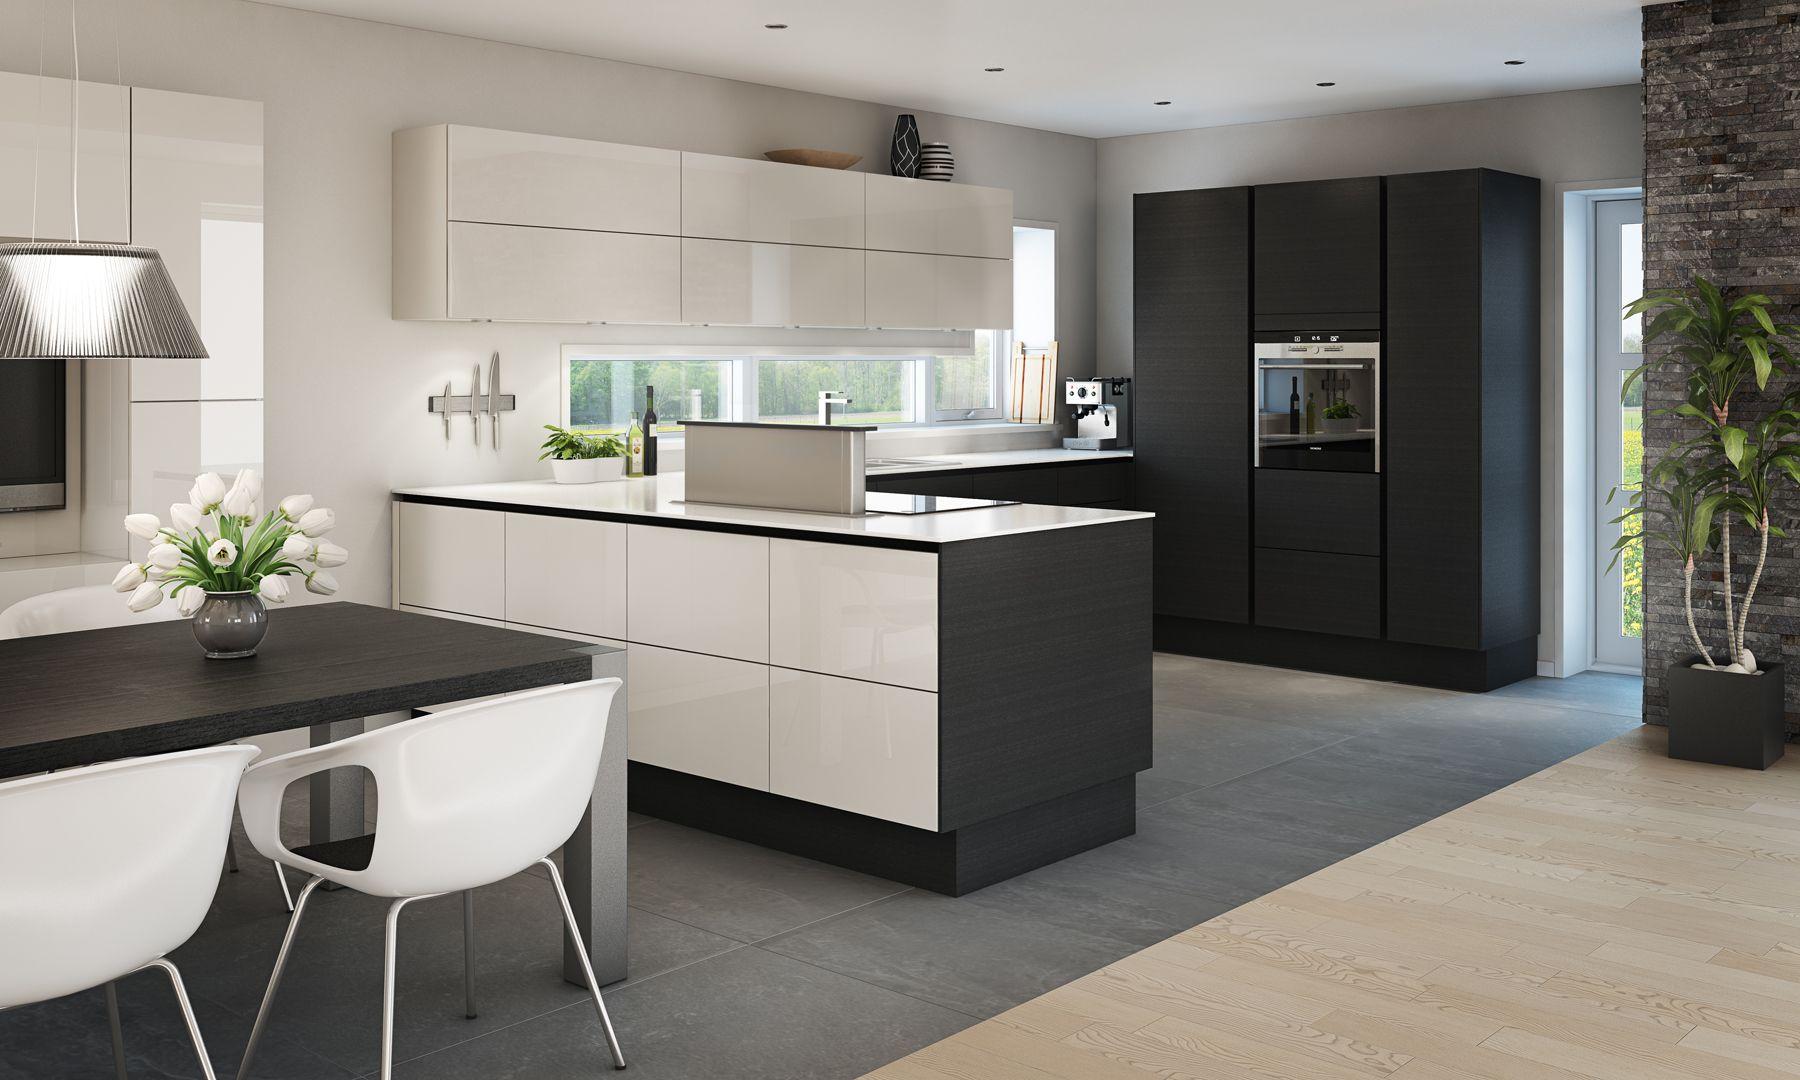 black wood / white modern kitchen Køkkendesign, Køkken